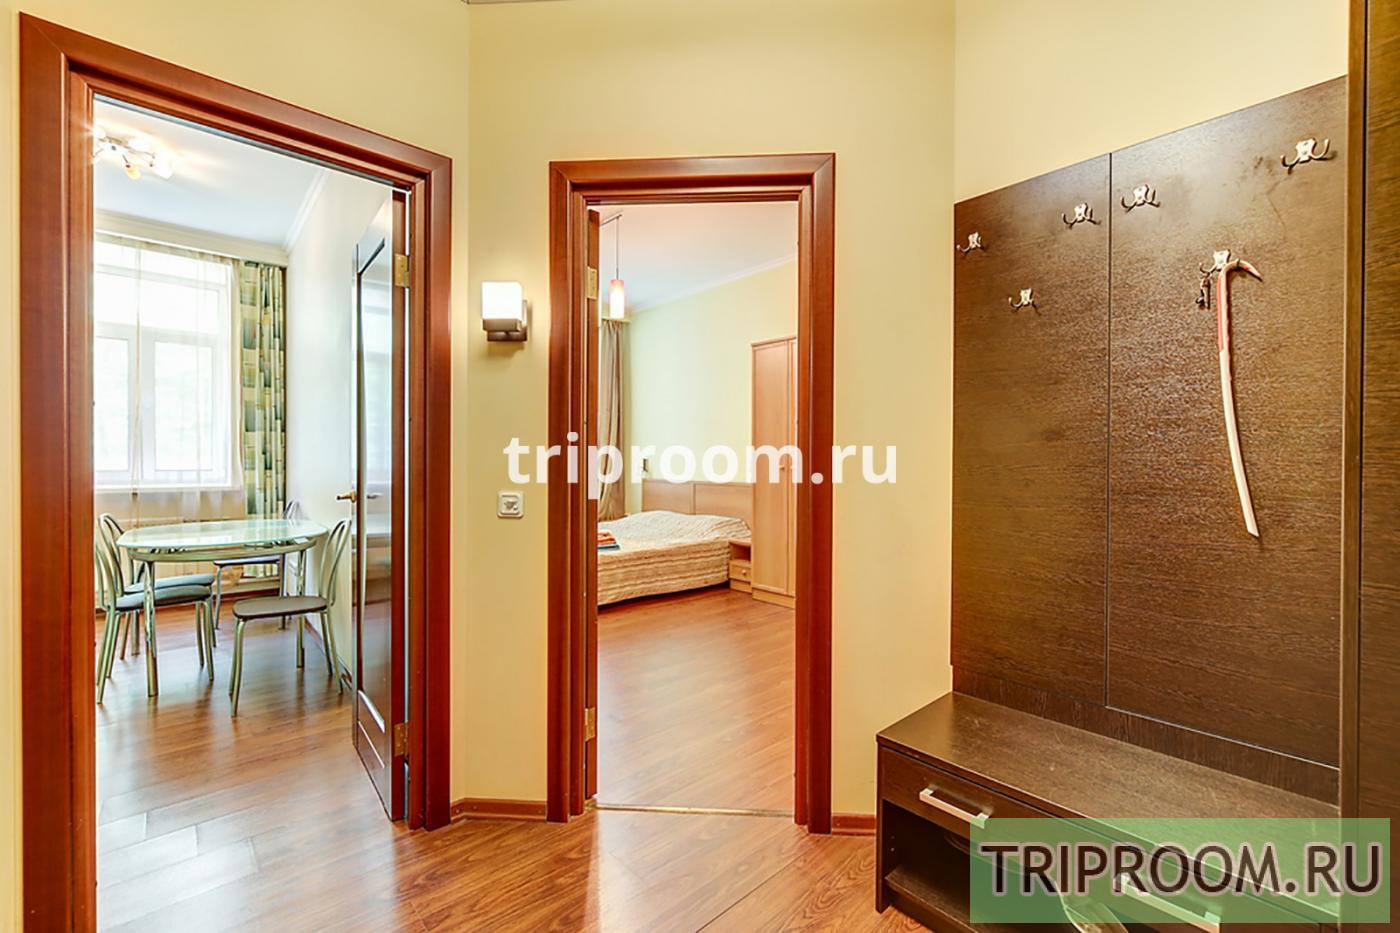 1-комнатная квартира посуточно (вариант № 15527), ул. Канала Грибоедова набережная, фото № 7